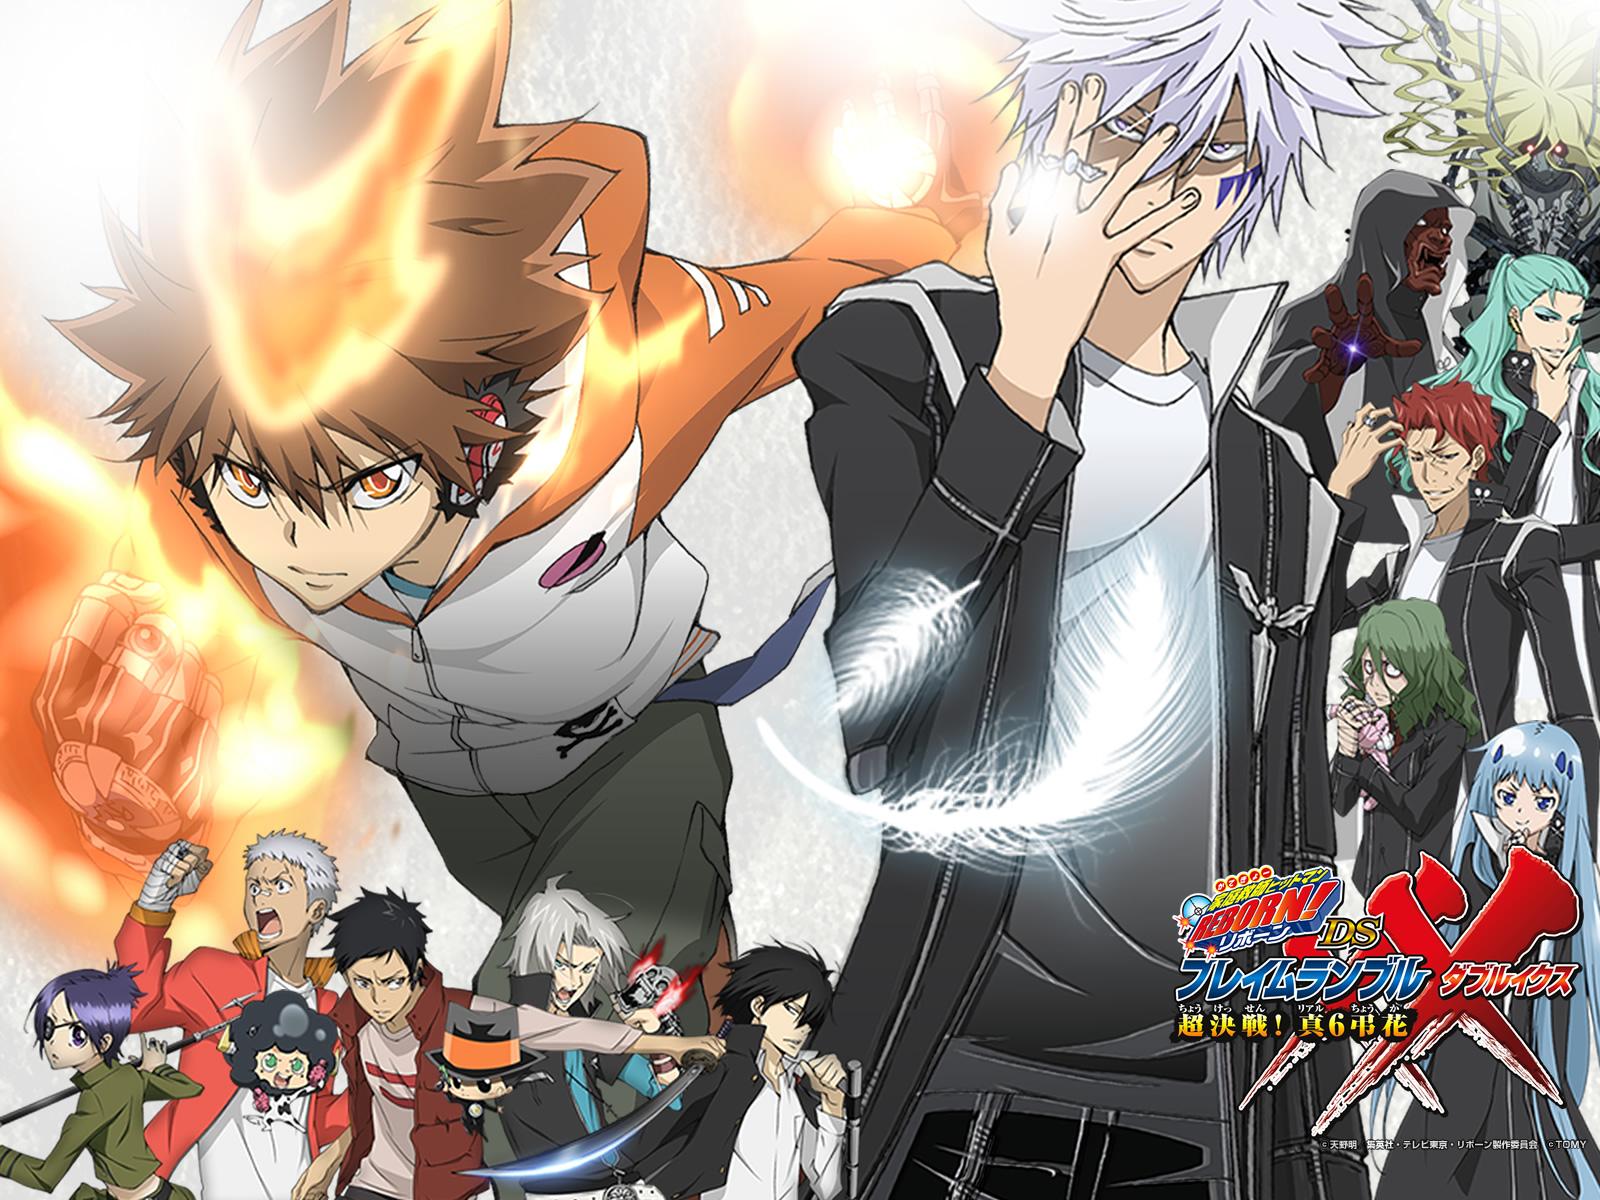 Katekyo hitman reborn wallpaper 218647 zerochan anime image board view fullsize katekyo hitman reborn image voltagebd Gallery